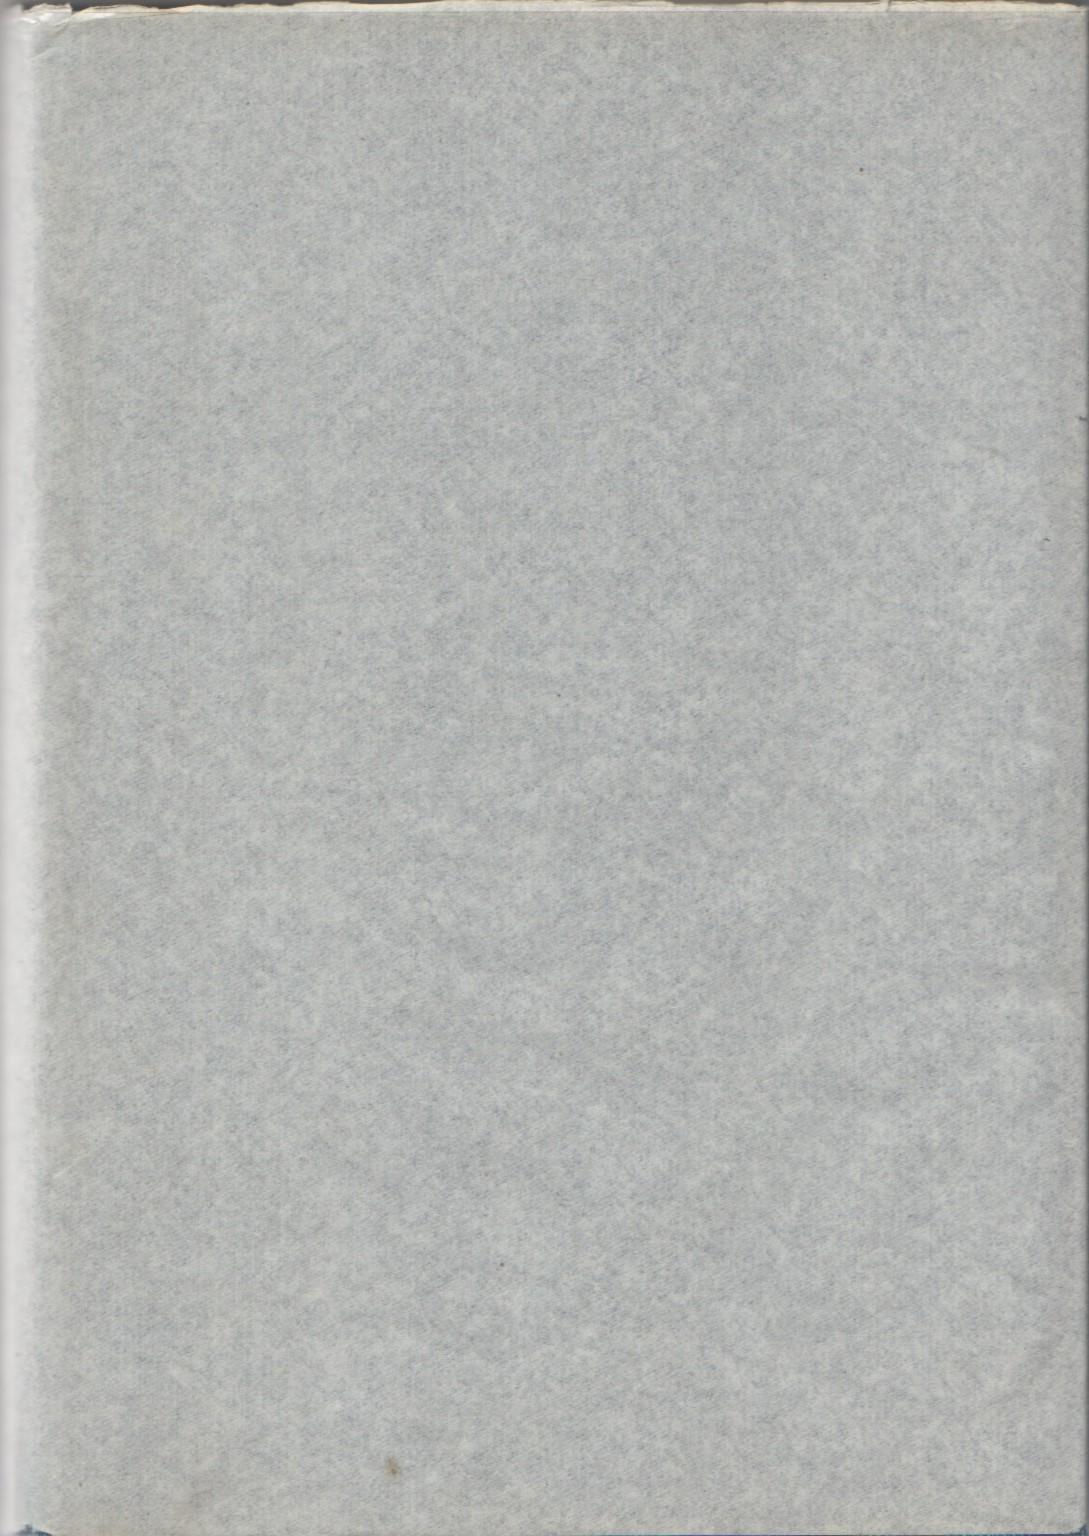 (BRAKHAGE, STAN). BRAKHAGE, STAN. ROBERT A. HALLER, EDITOR - BRAKHAGE SCRAPBOOK: COLLECTED WRITINGS 1964-1980 - DELUXE SIGNED LIMITED EDITION